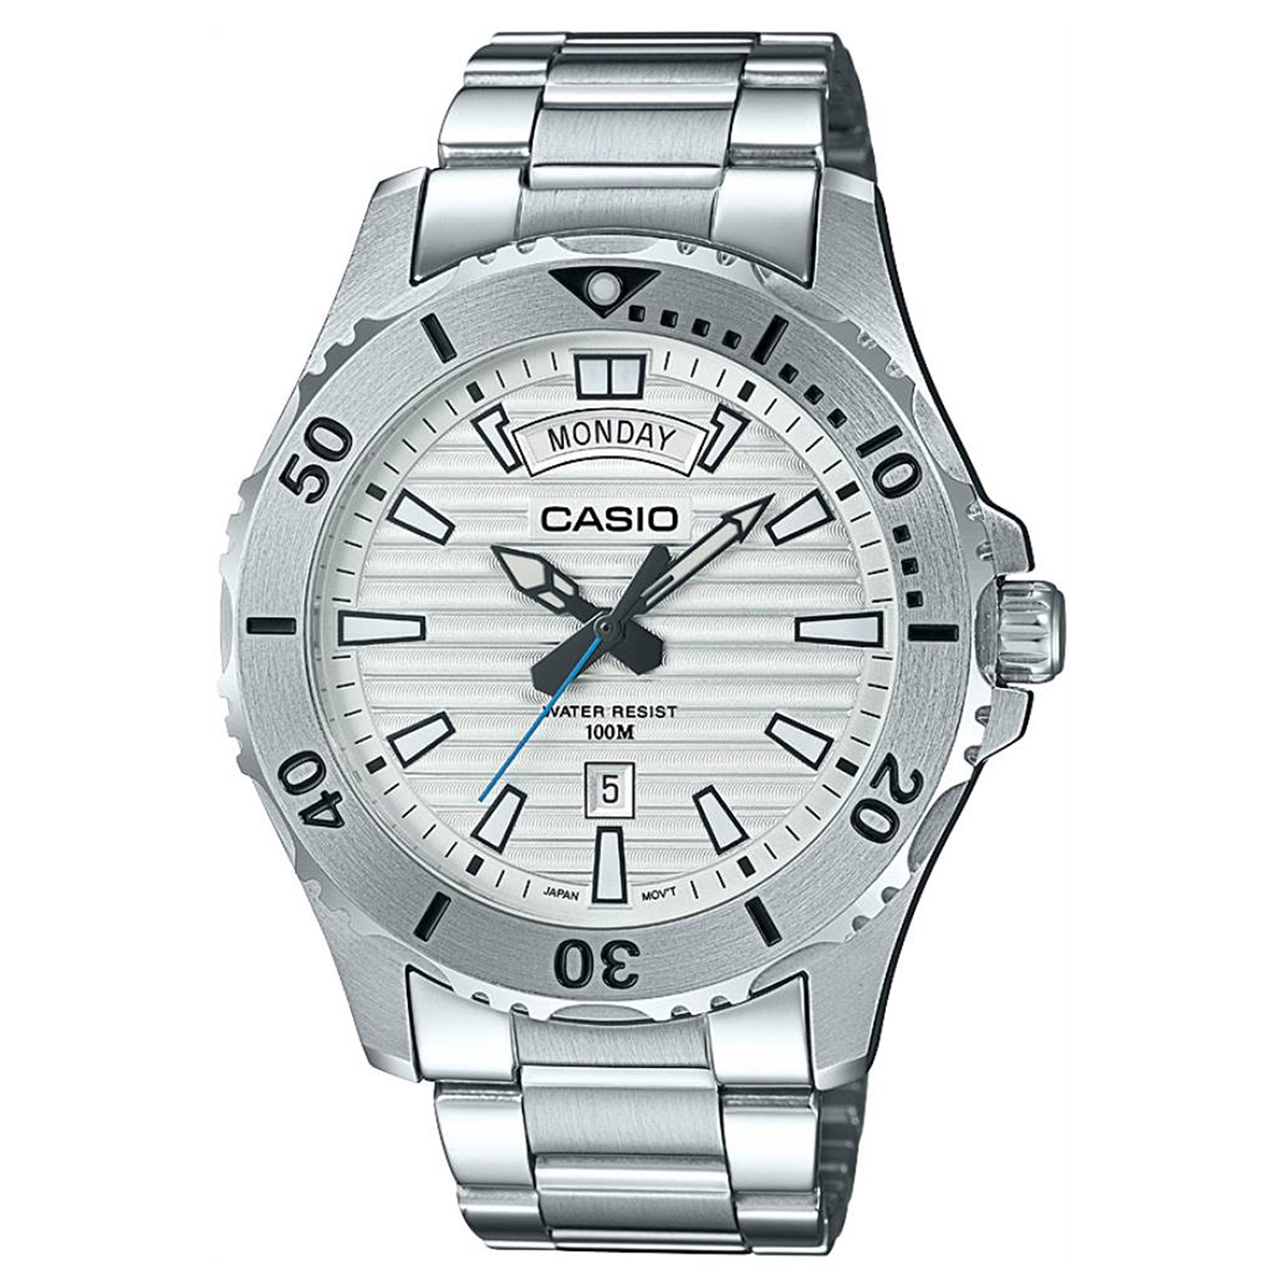 ساعت  کاسیو مدل MTD-1087D-7AVDF